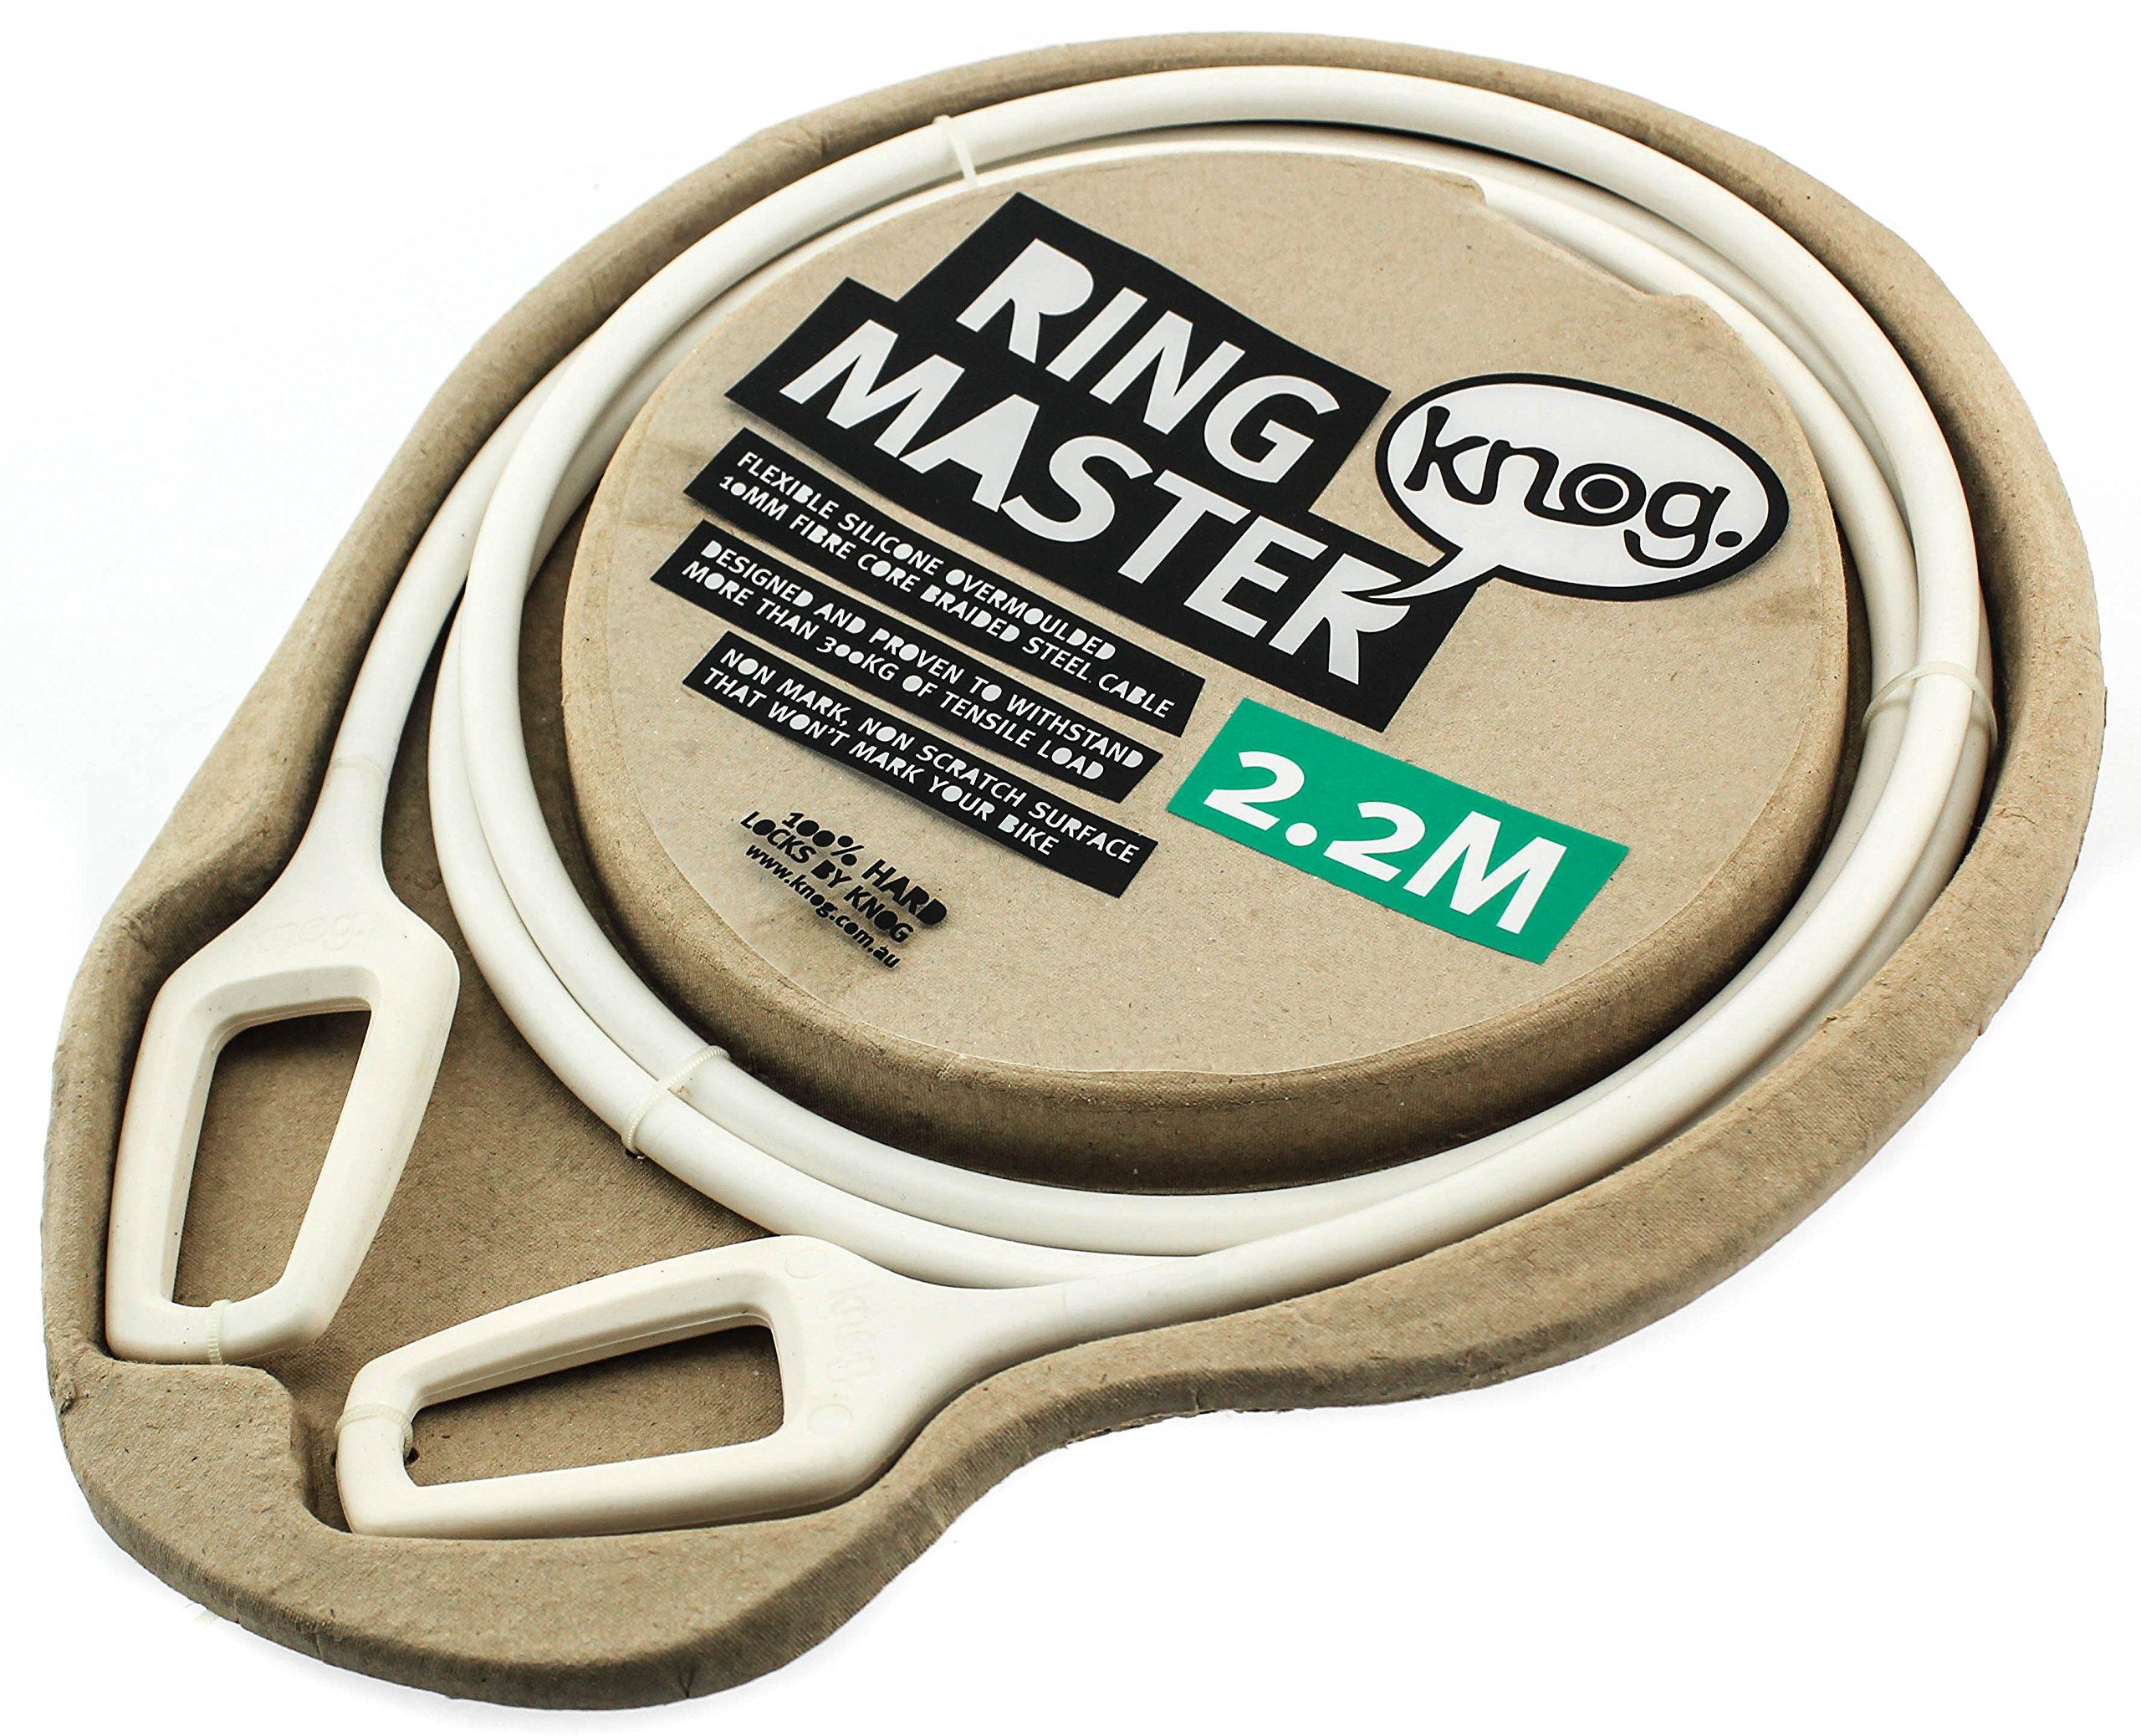 KNOG Ringmaster 2.2 Cable (White)